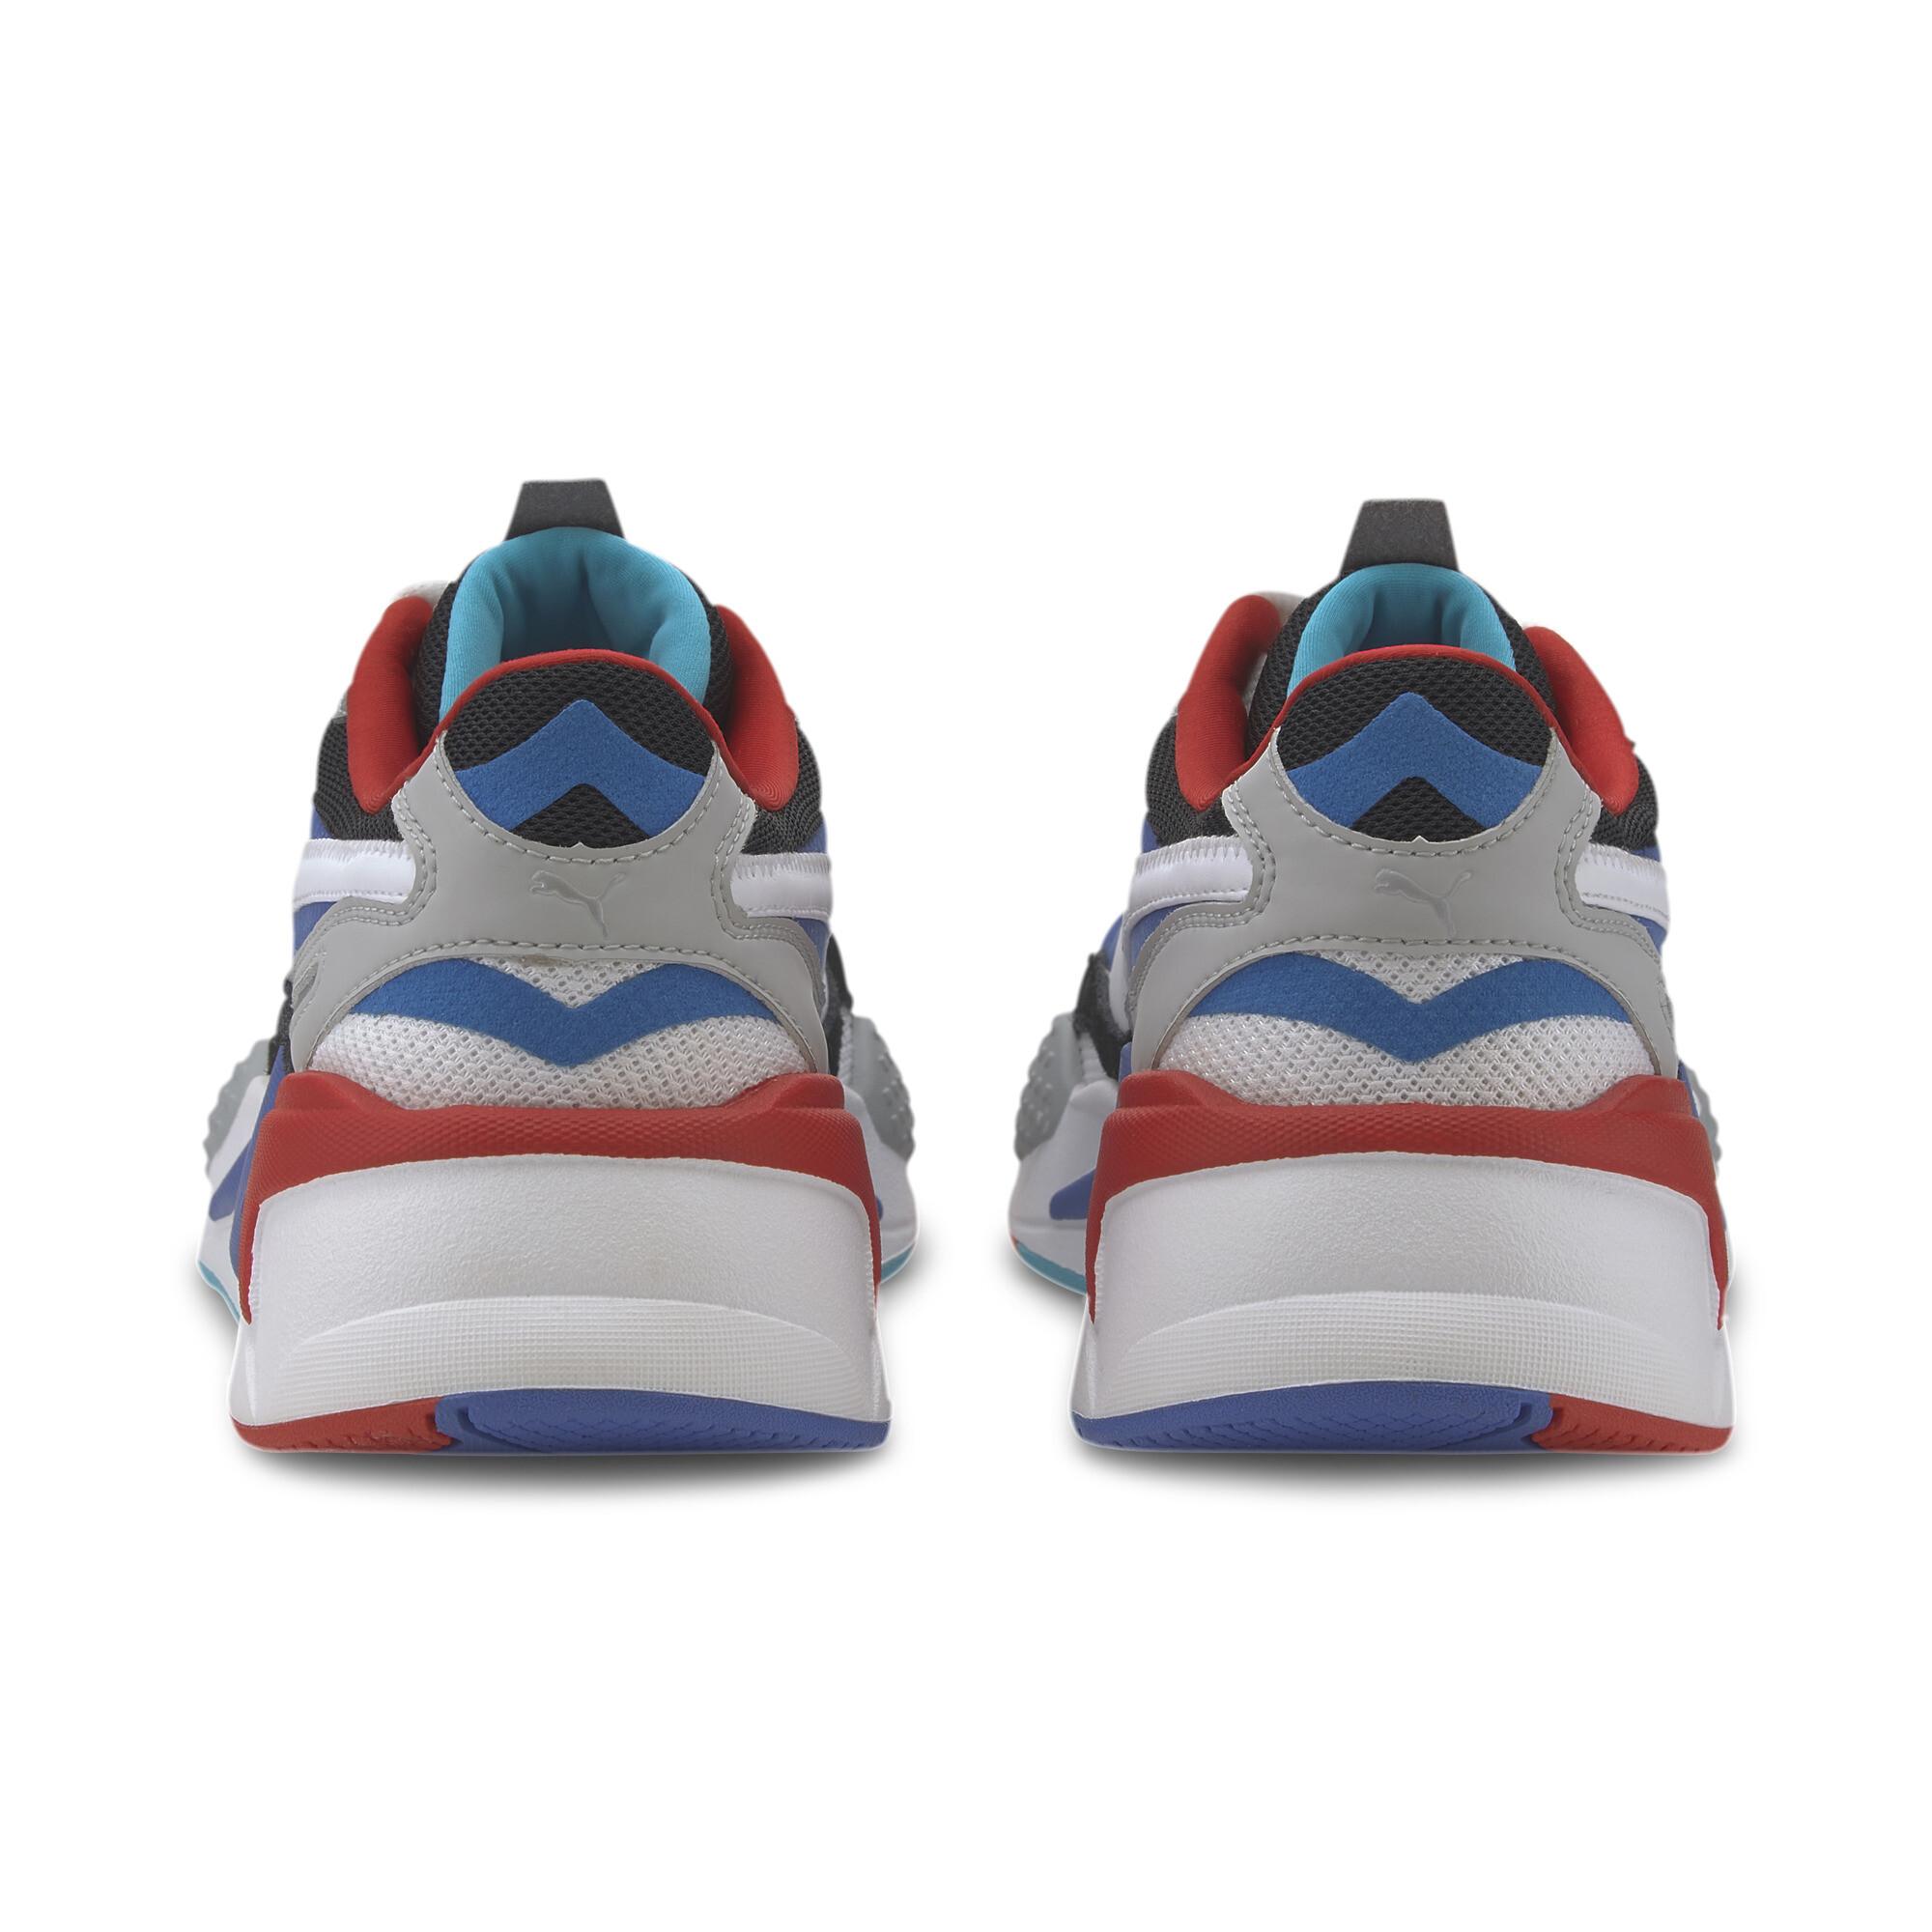 PUMA-Men-039-s-RS-X-Puzzle-Sneakers thumbnail 3